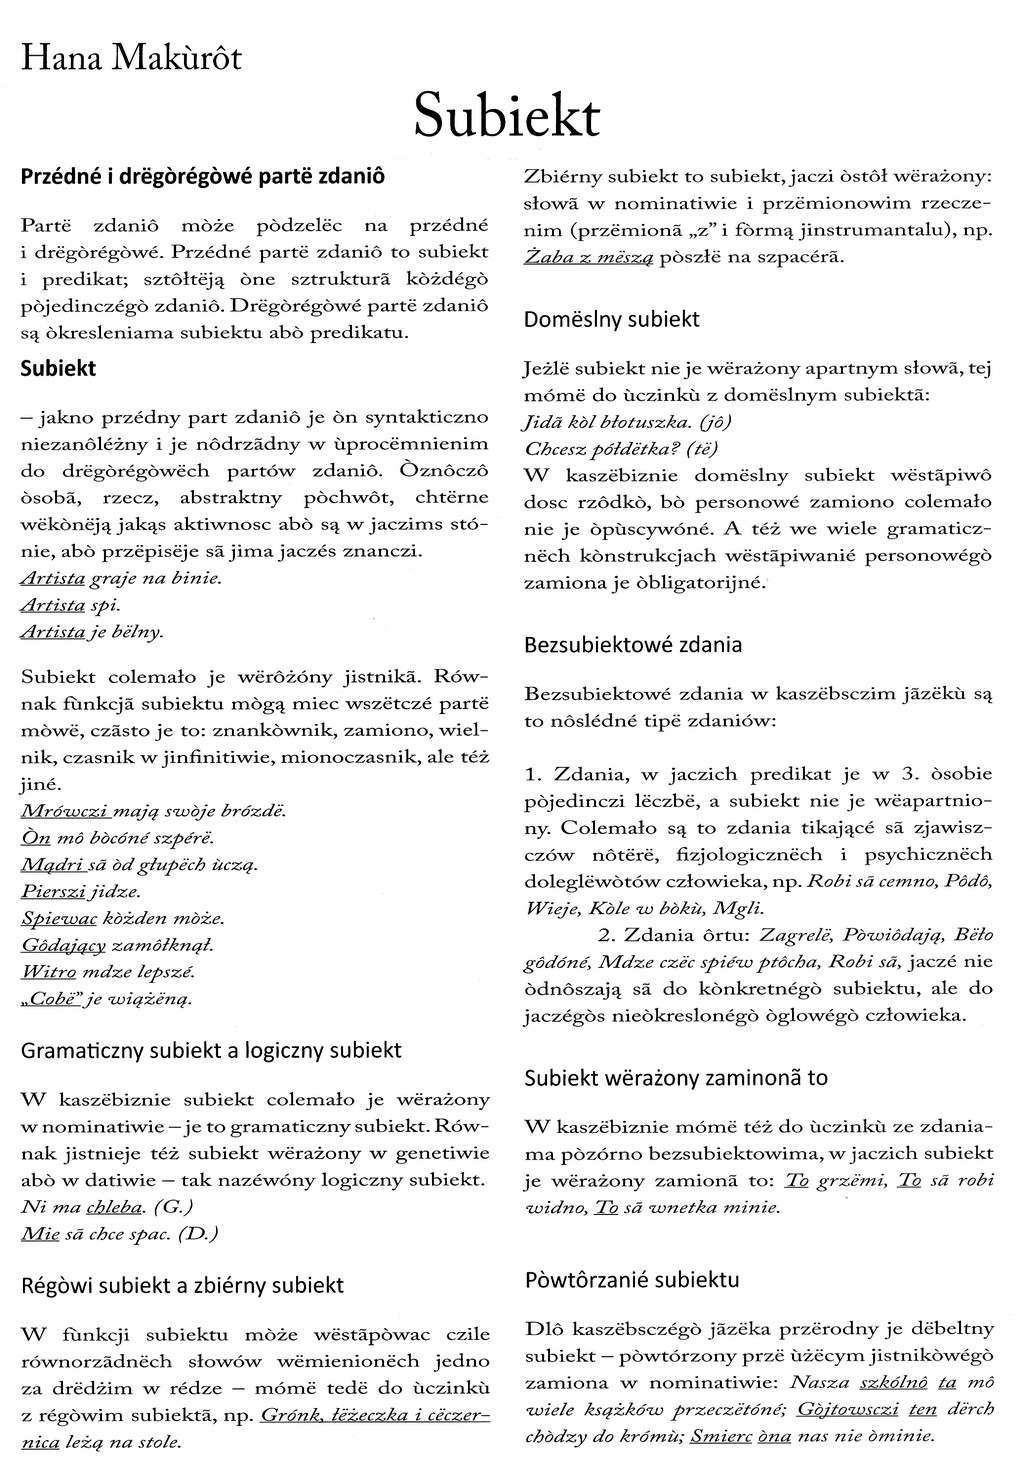 Subiekt_image00167